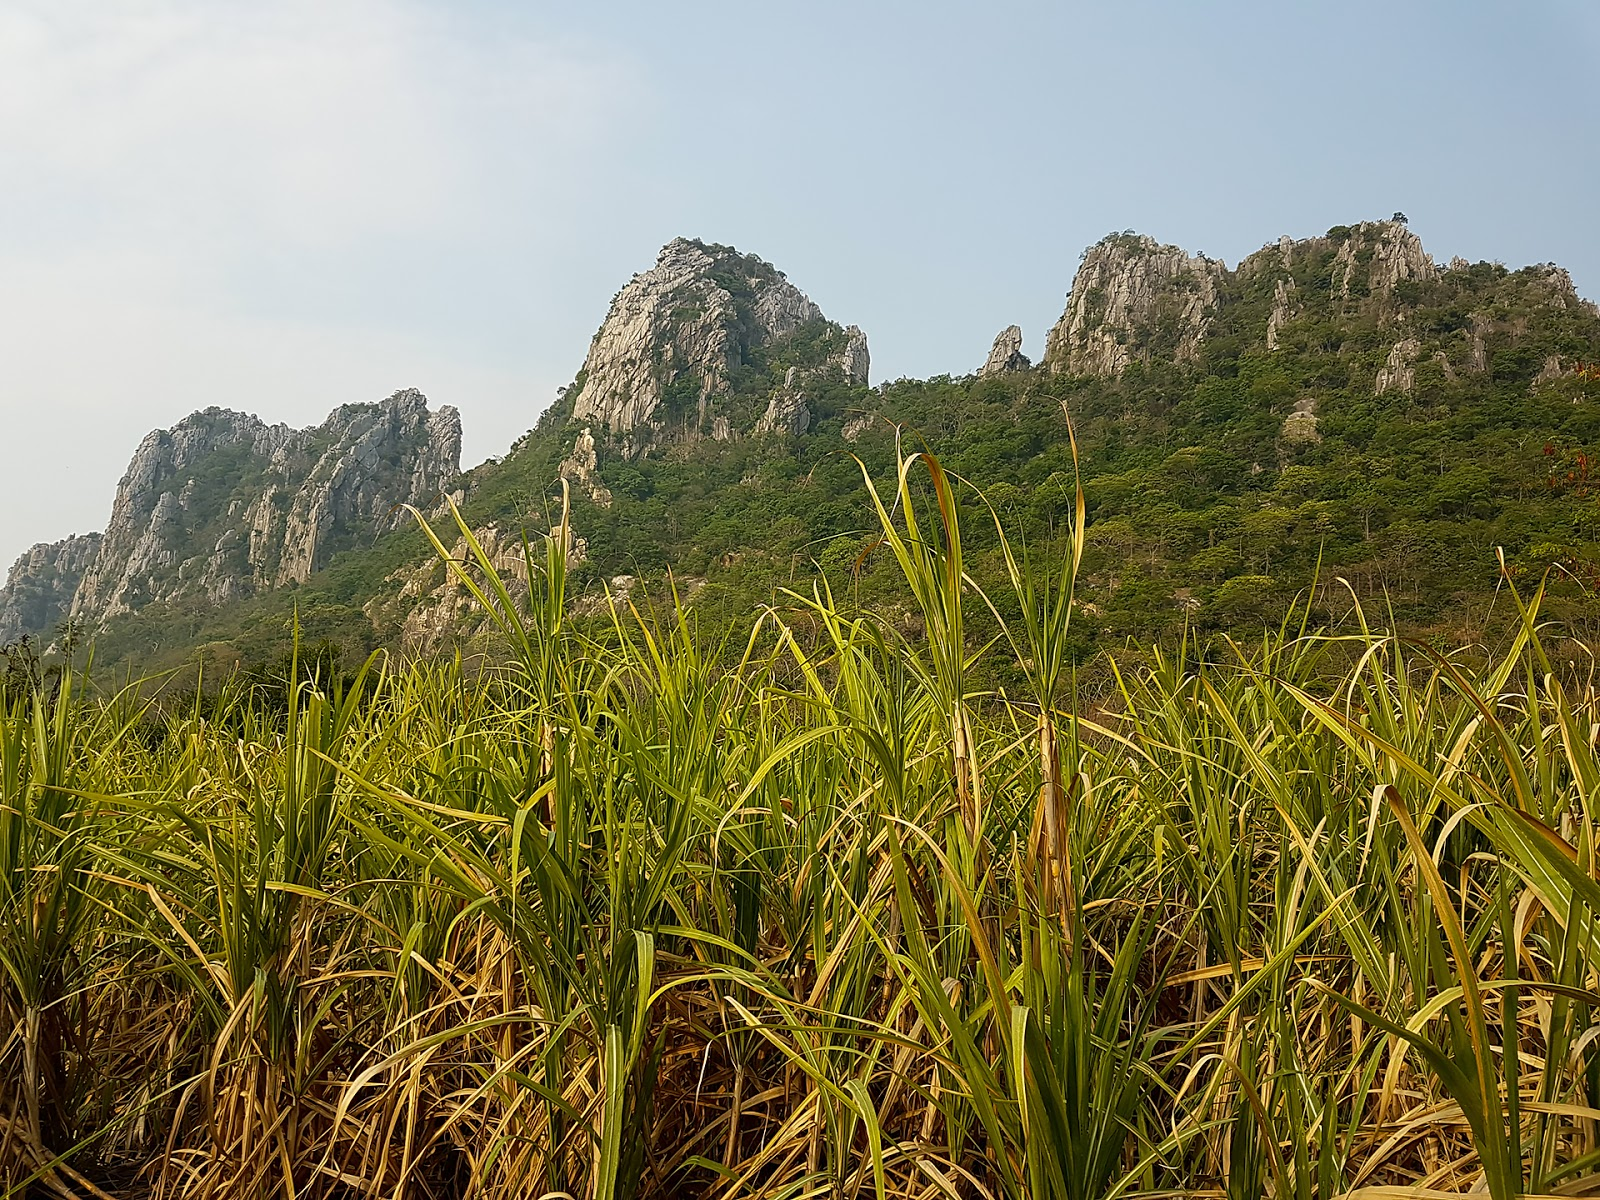 wapienne skały, Khao no khao kaeo,Tajlandia